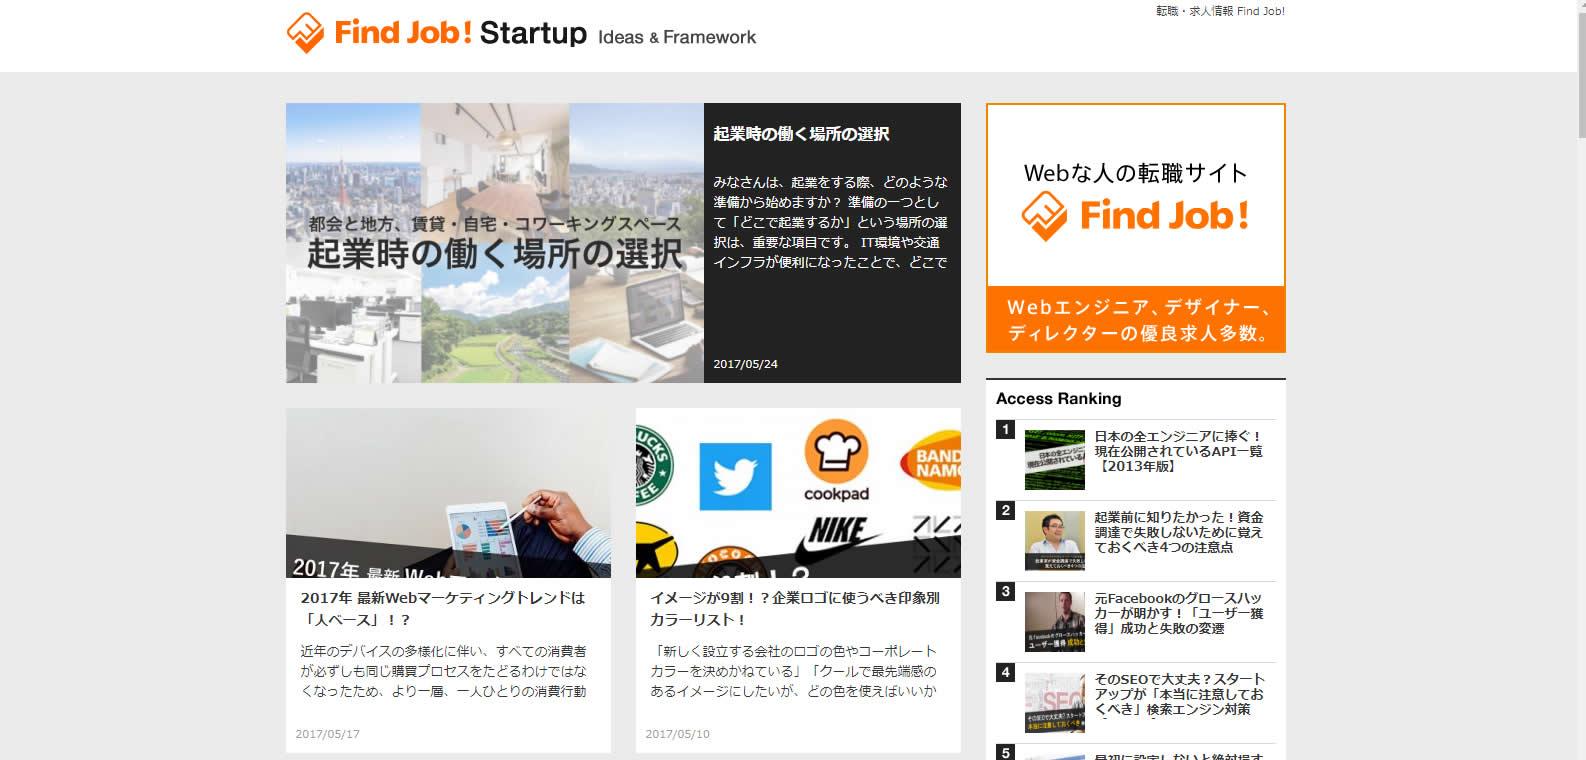 Find Job ! Startup